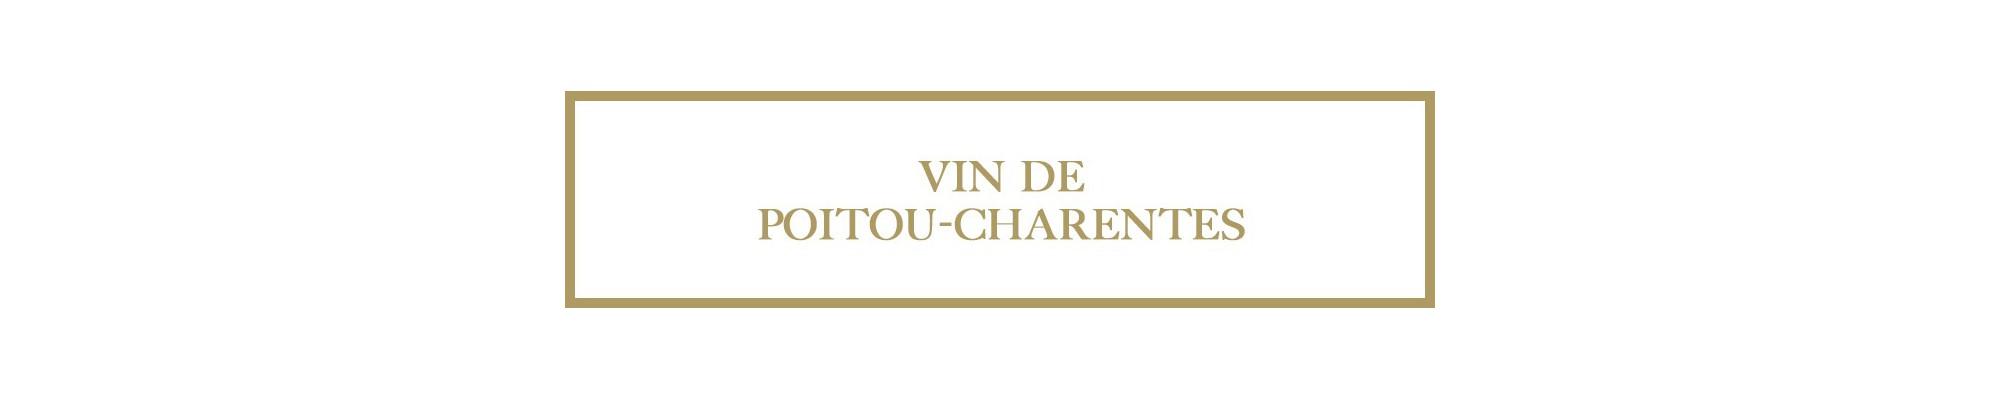 Vins de Poitou-Charentes